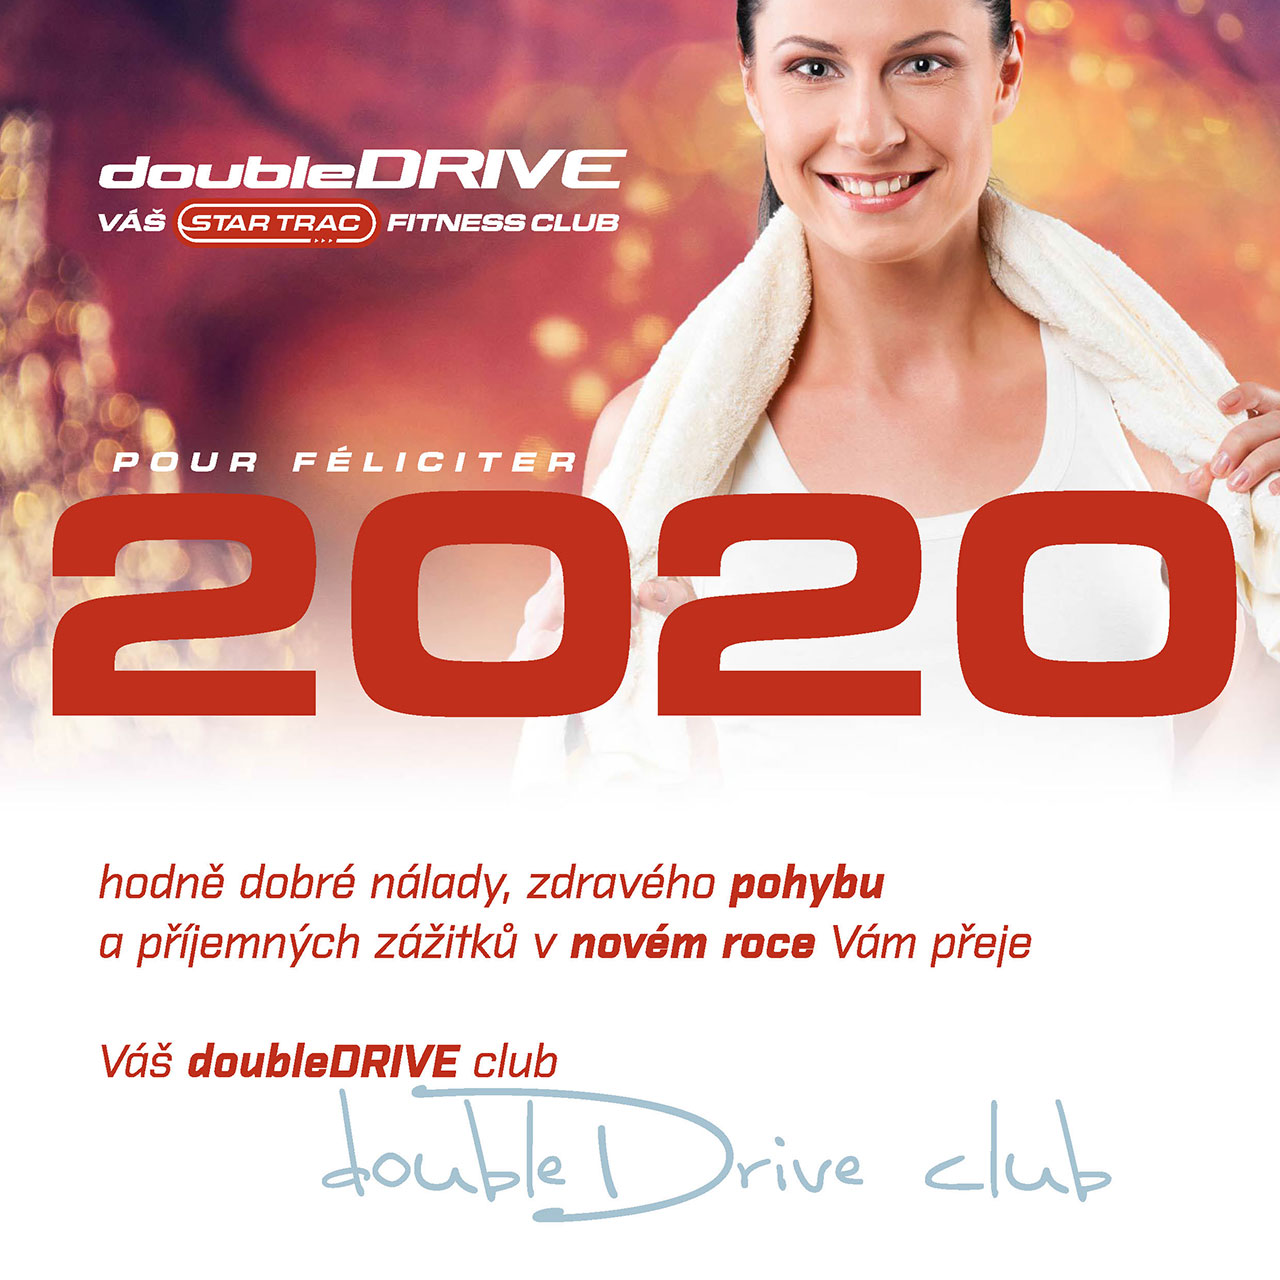 Ddc Fp2020